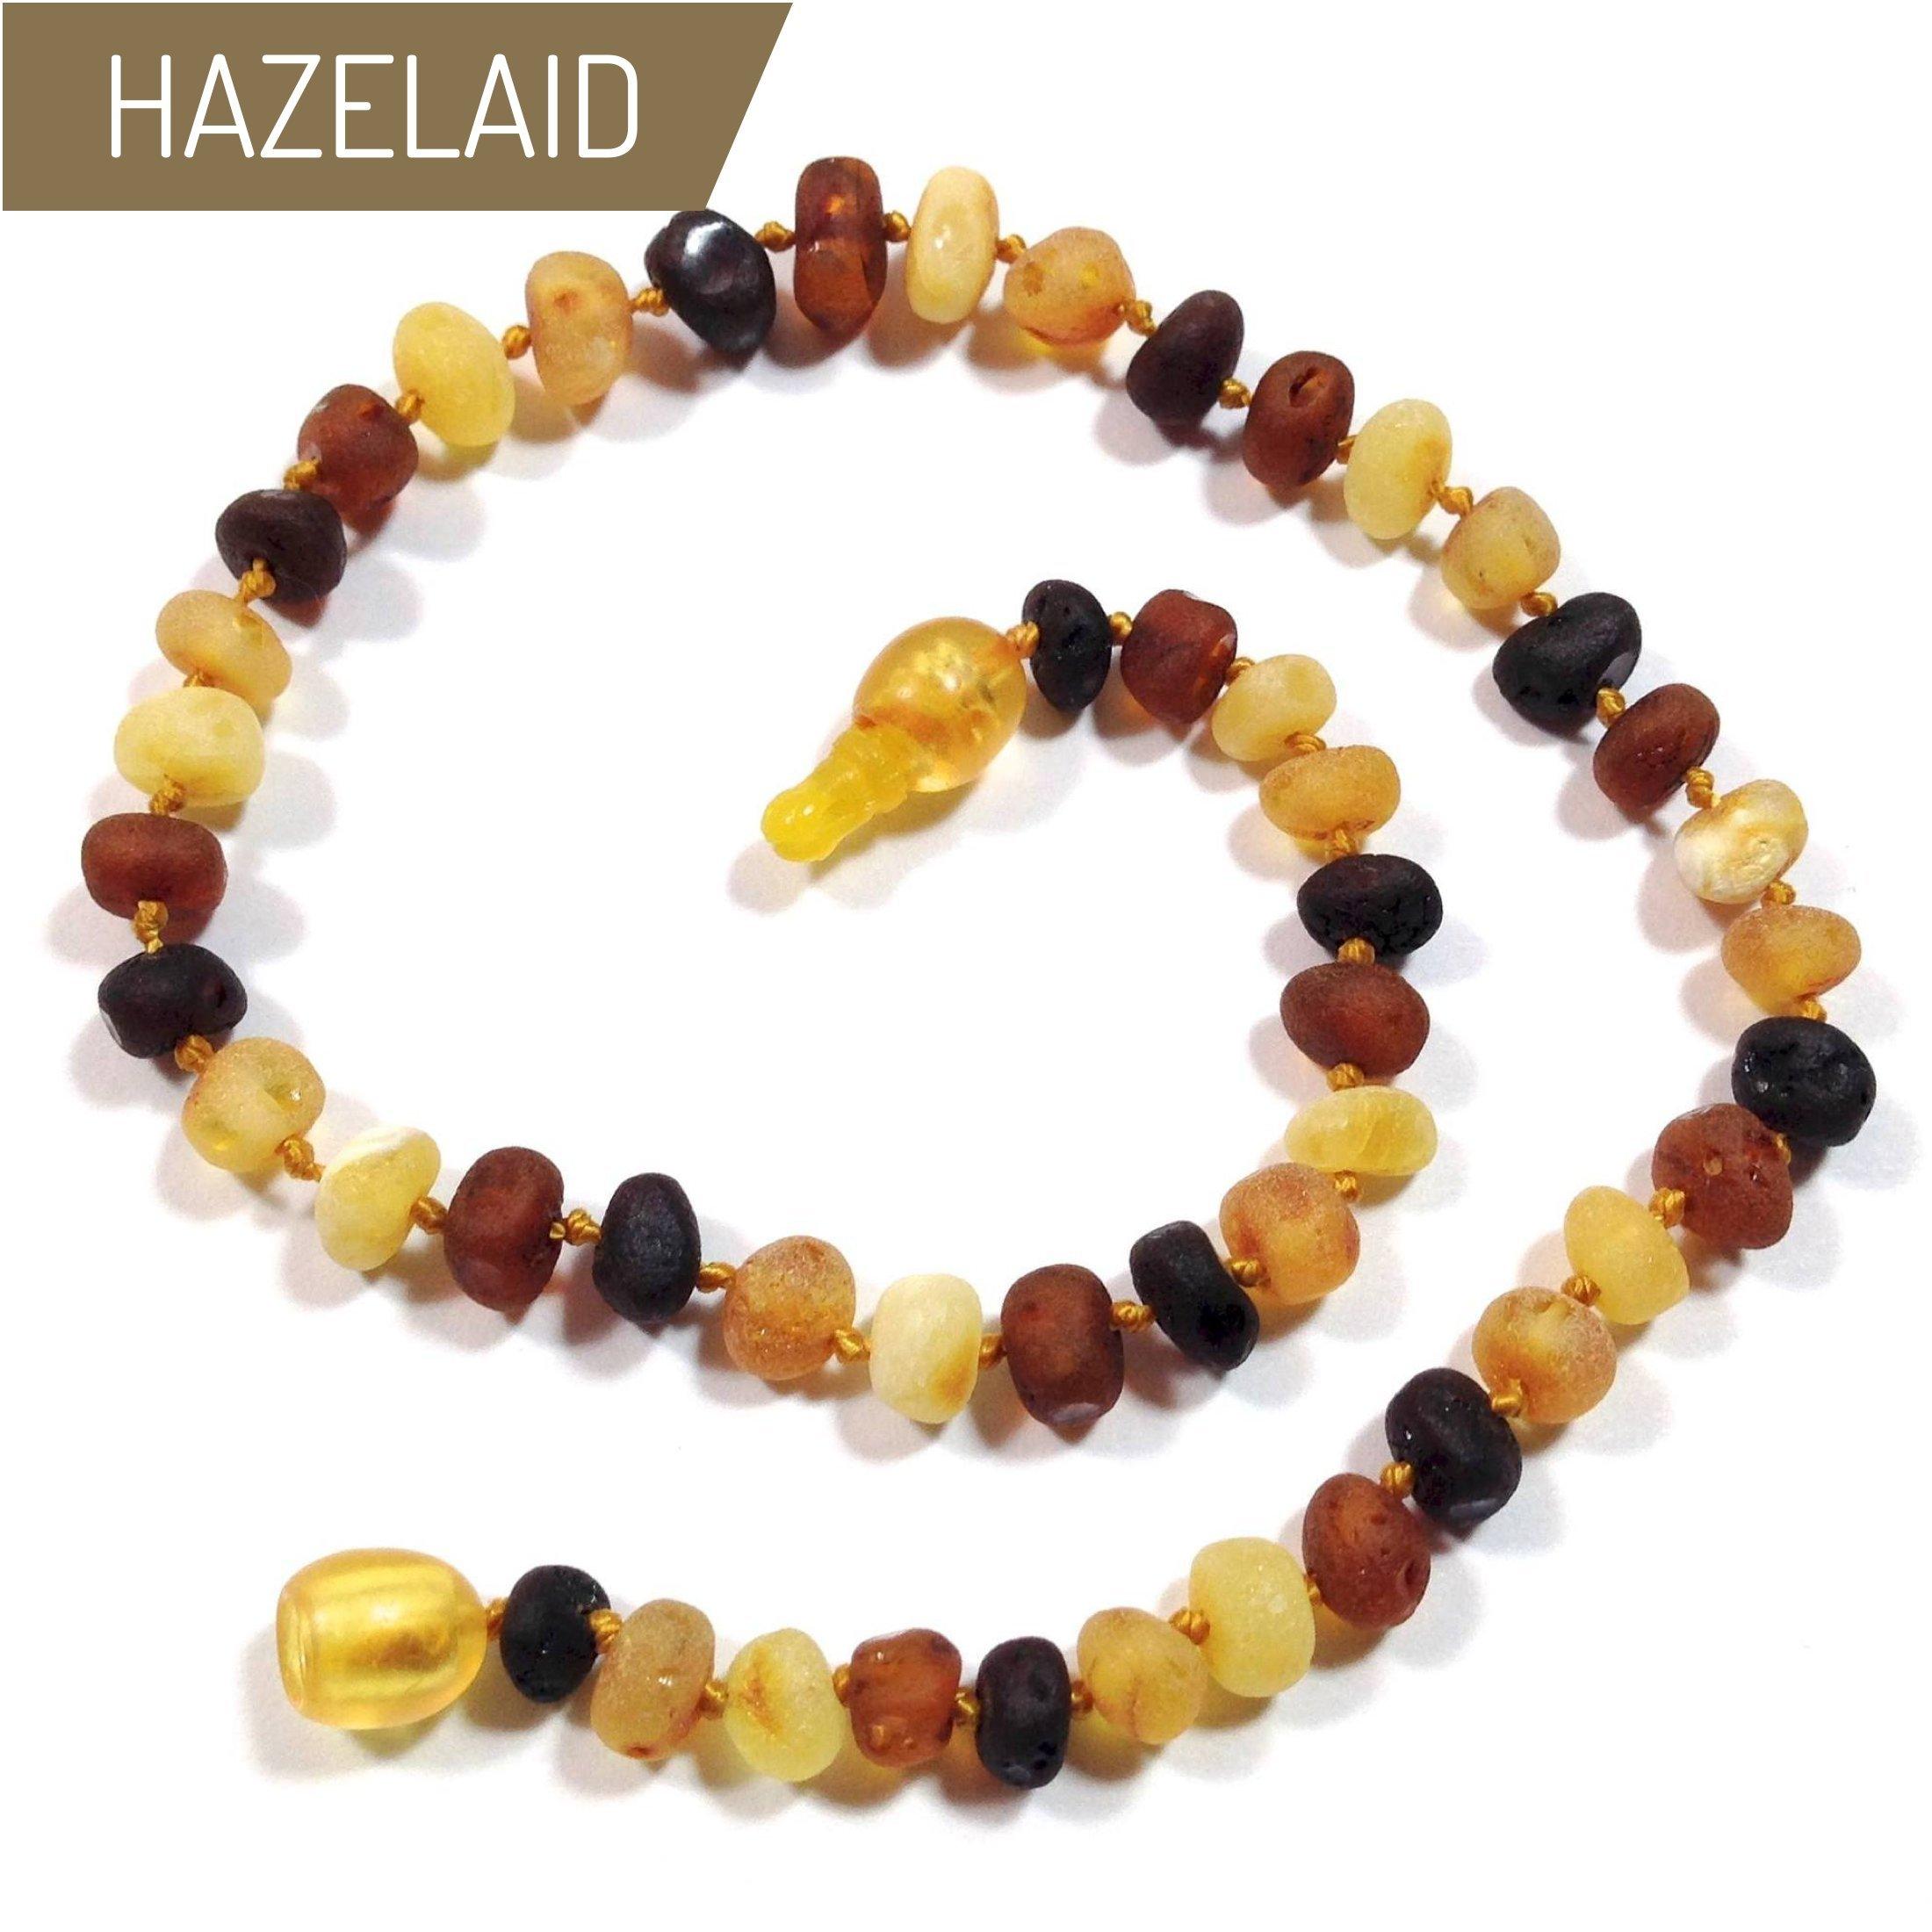 Hazelaid (TM) 12'' Pop-Clasp Baltic Amber Multicolored Semi-Polish Necklace